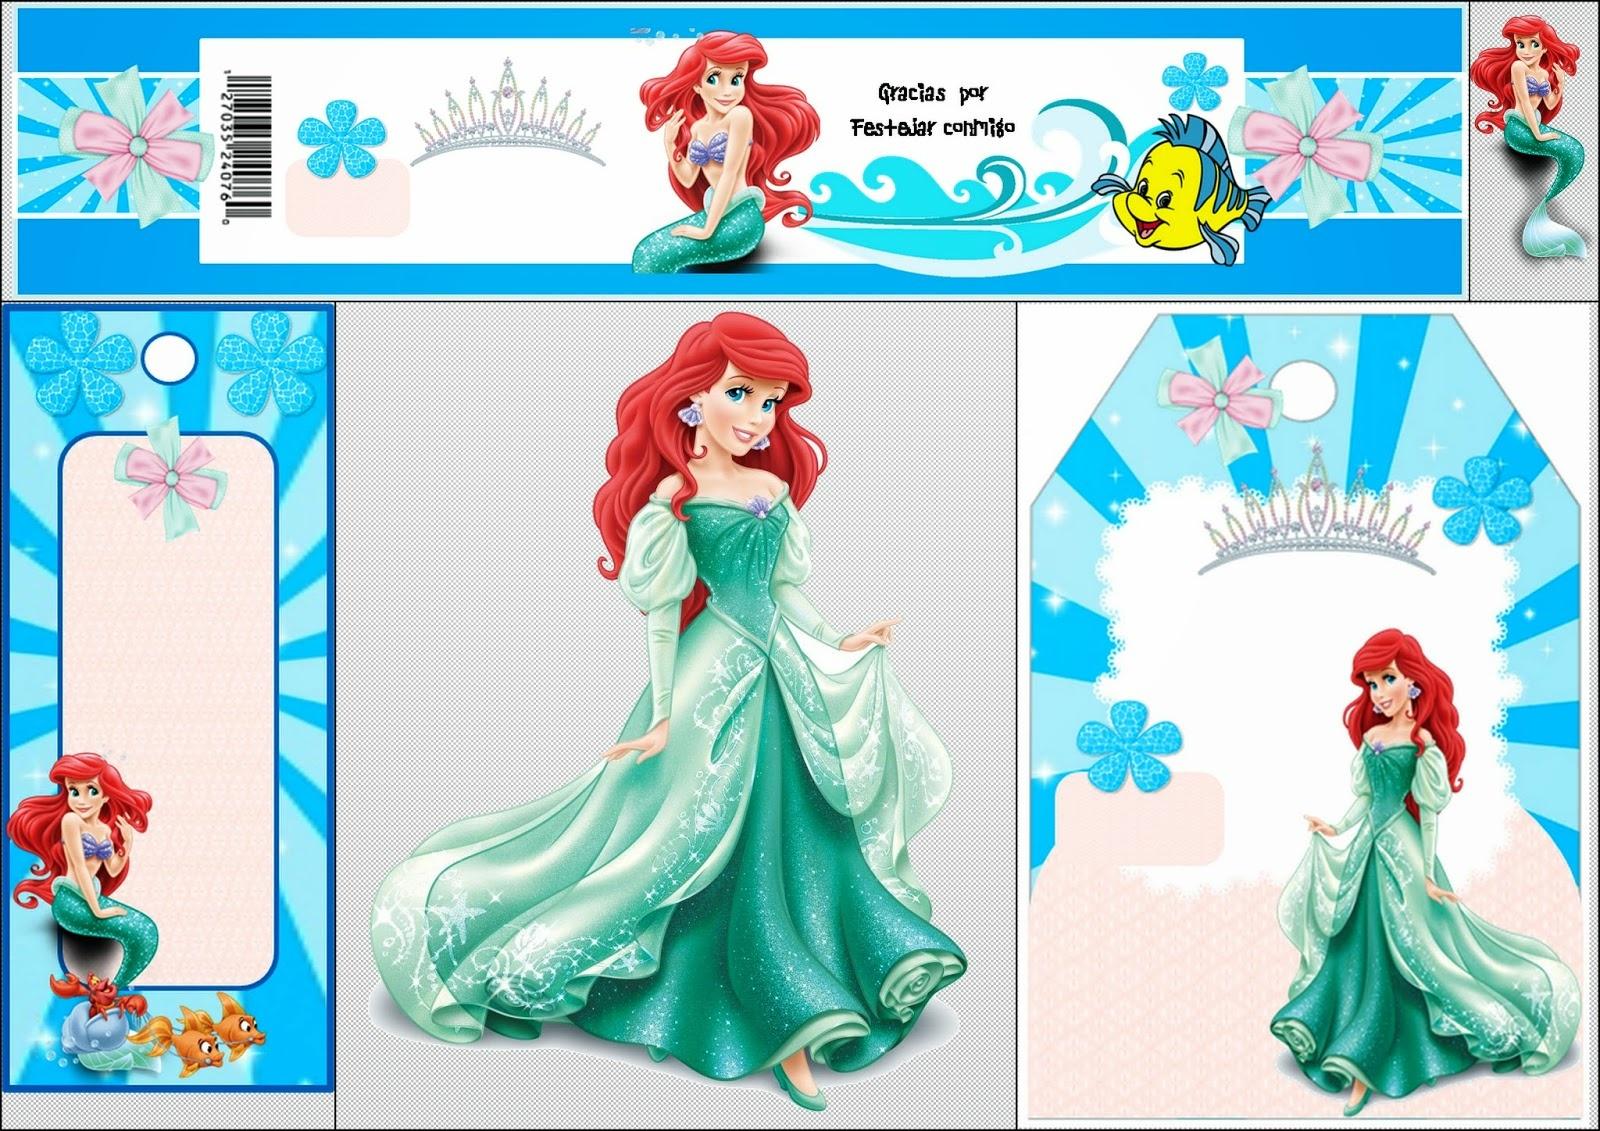 Free Printable Mini Kit For Your Little Mermaid Party. - Oh My - Free Printable Little Mermaid Water Bottle Labels